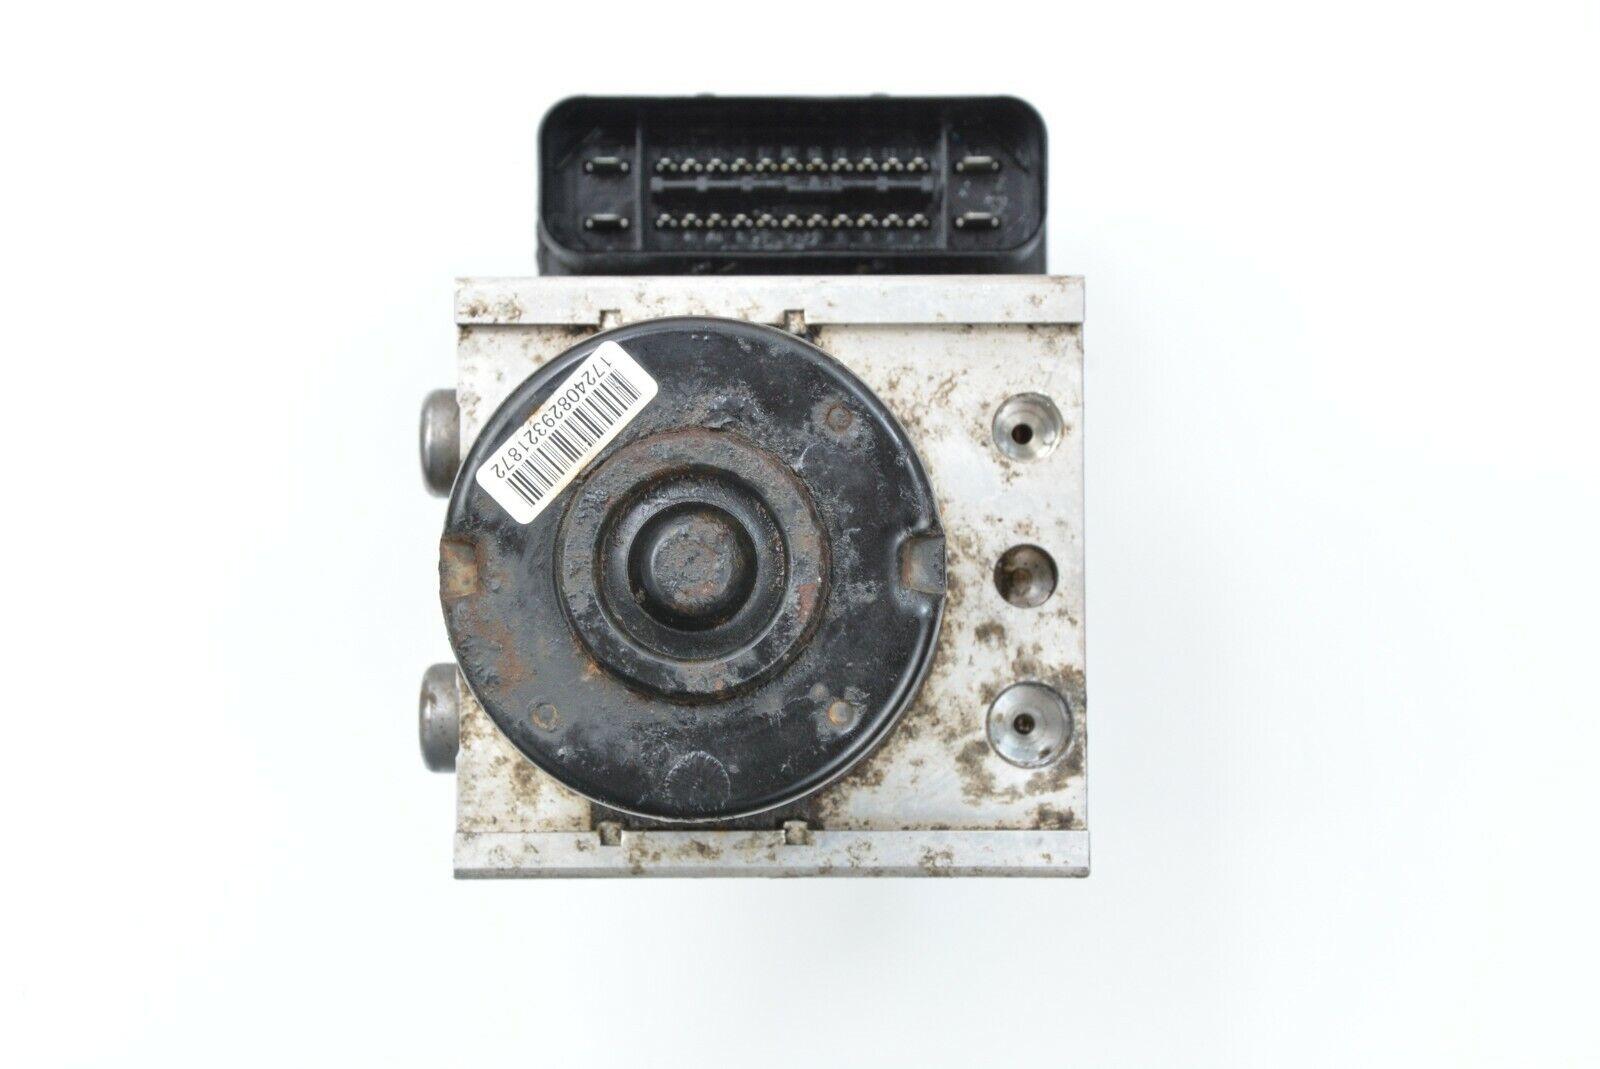 ABS Pump for Peugeot 207, Ate 9663945580 MK70CEM00 10.0207-0105.4